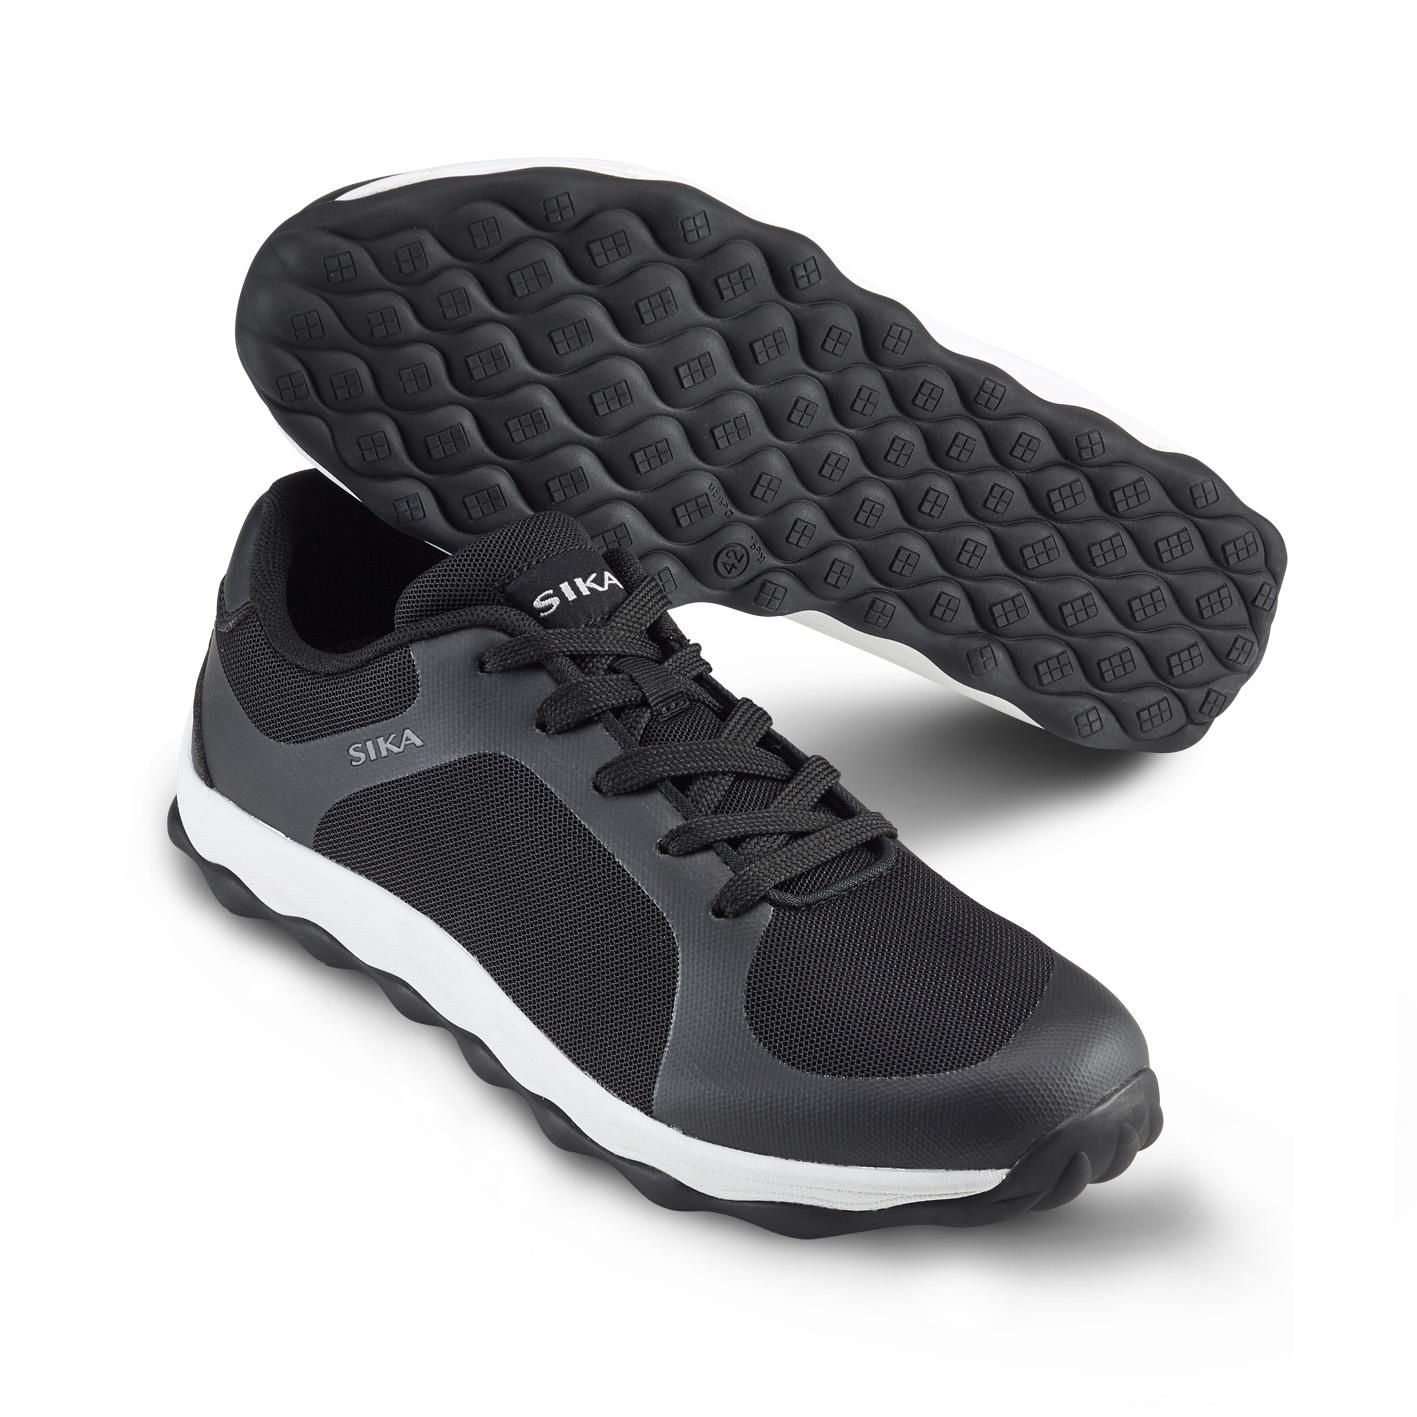 Mjuk arbetssko i sneakersmodell Svart/Vit (45)